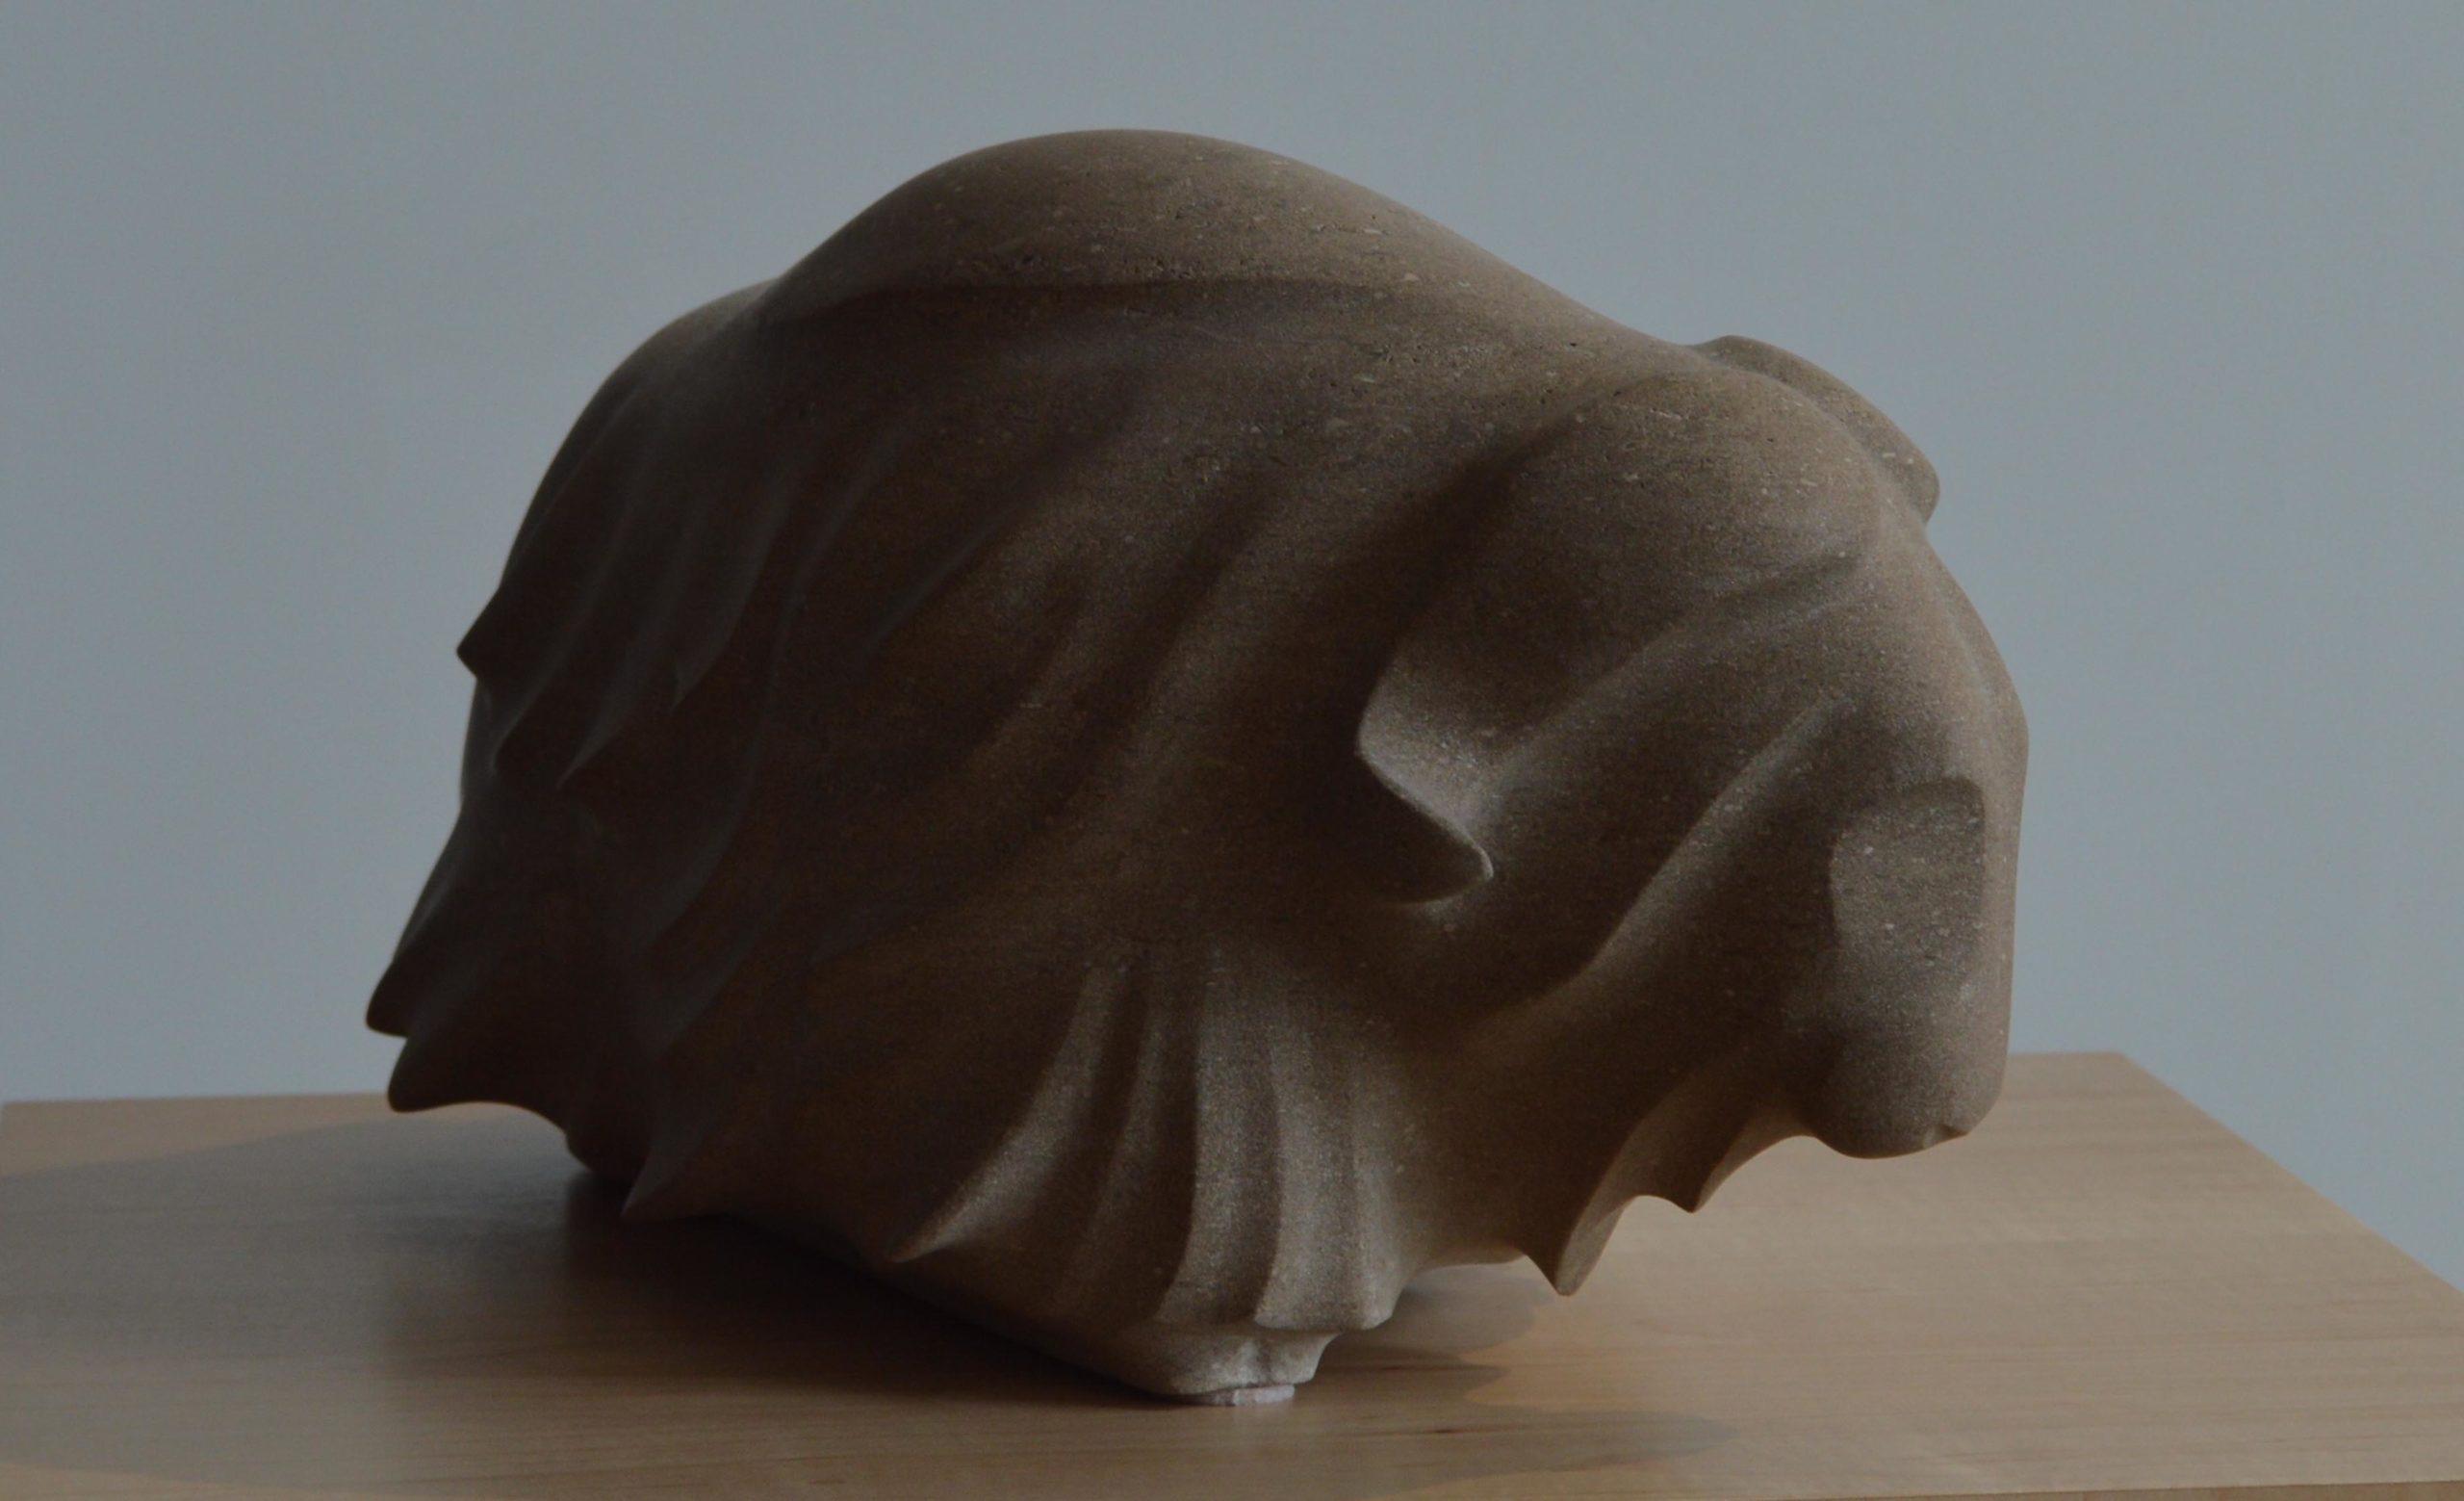 michael binkley sculptor stone sculpture arctic muskox carving fine art carrara marble vancouver canada